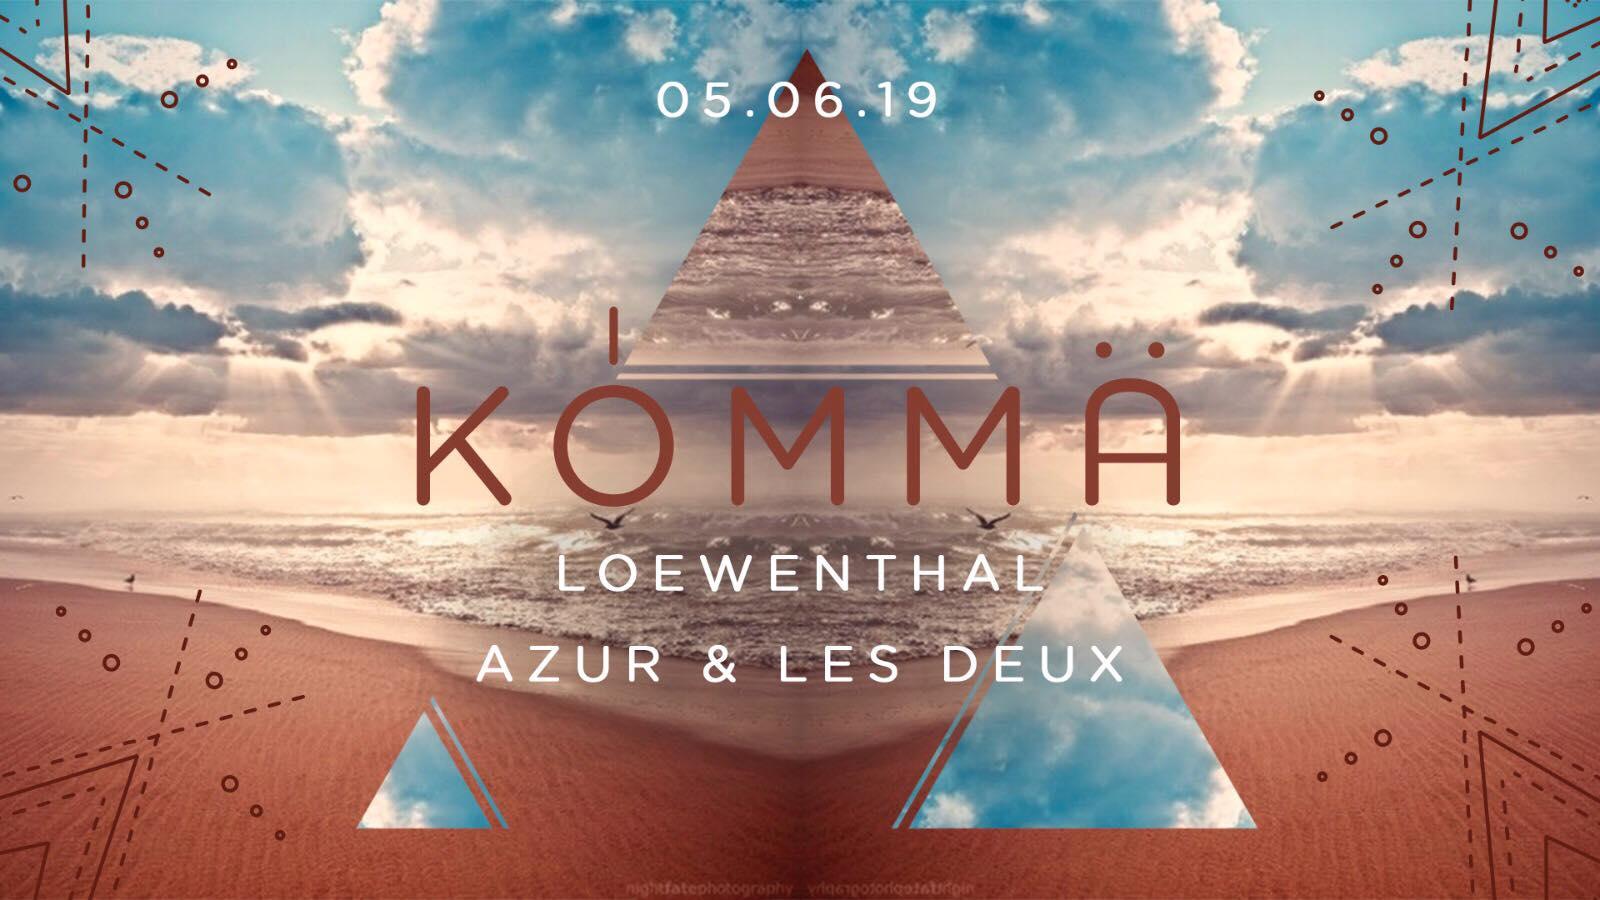 Kömma x Muzo Creative w/ Loewenthal, Azur, Les Deux